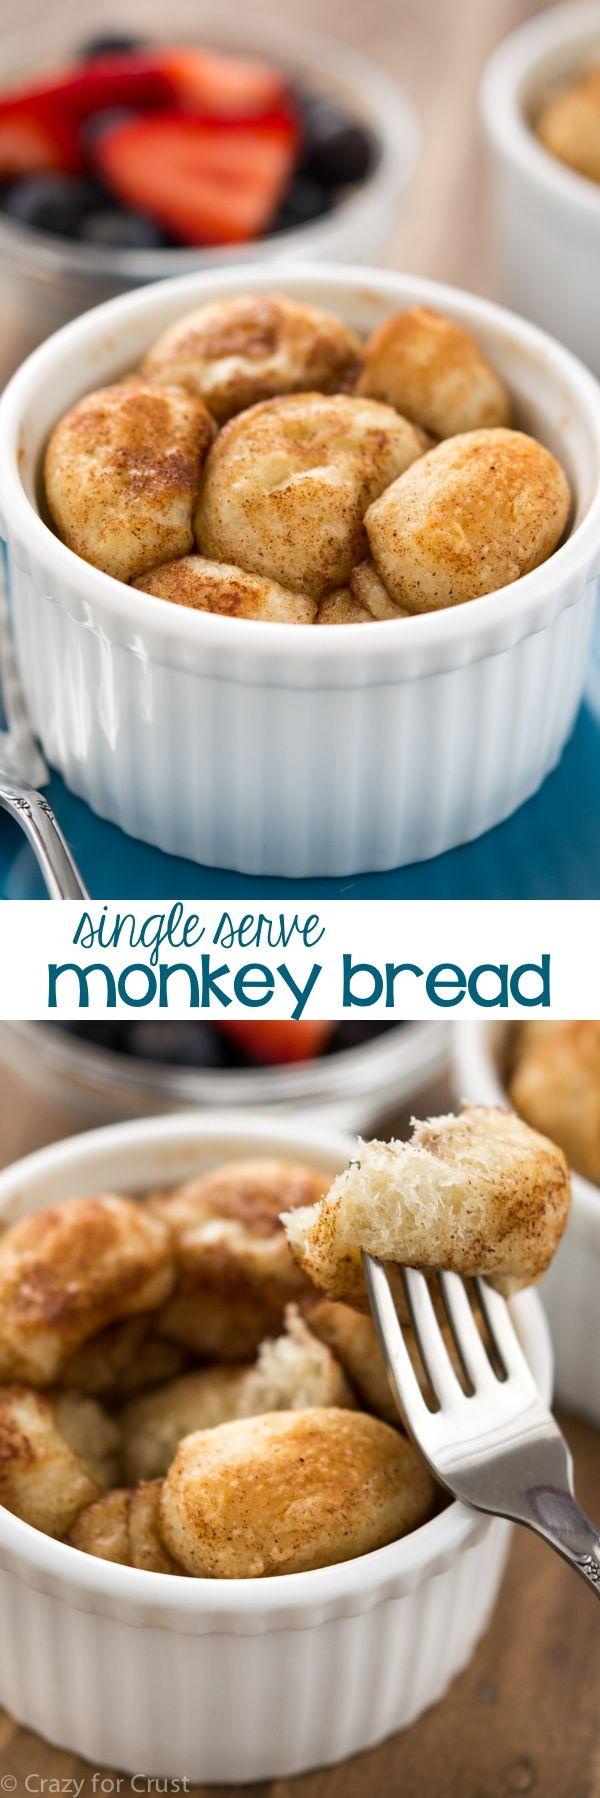 Single Serve Monkey Bread                                                                                                                                                                                 More